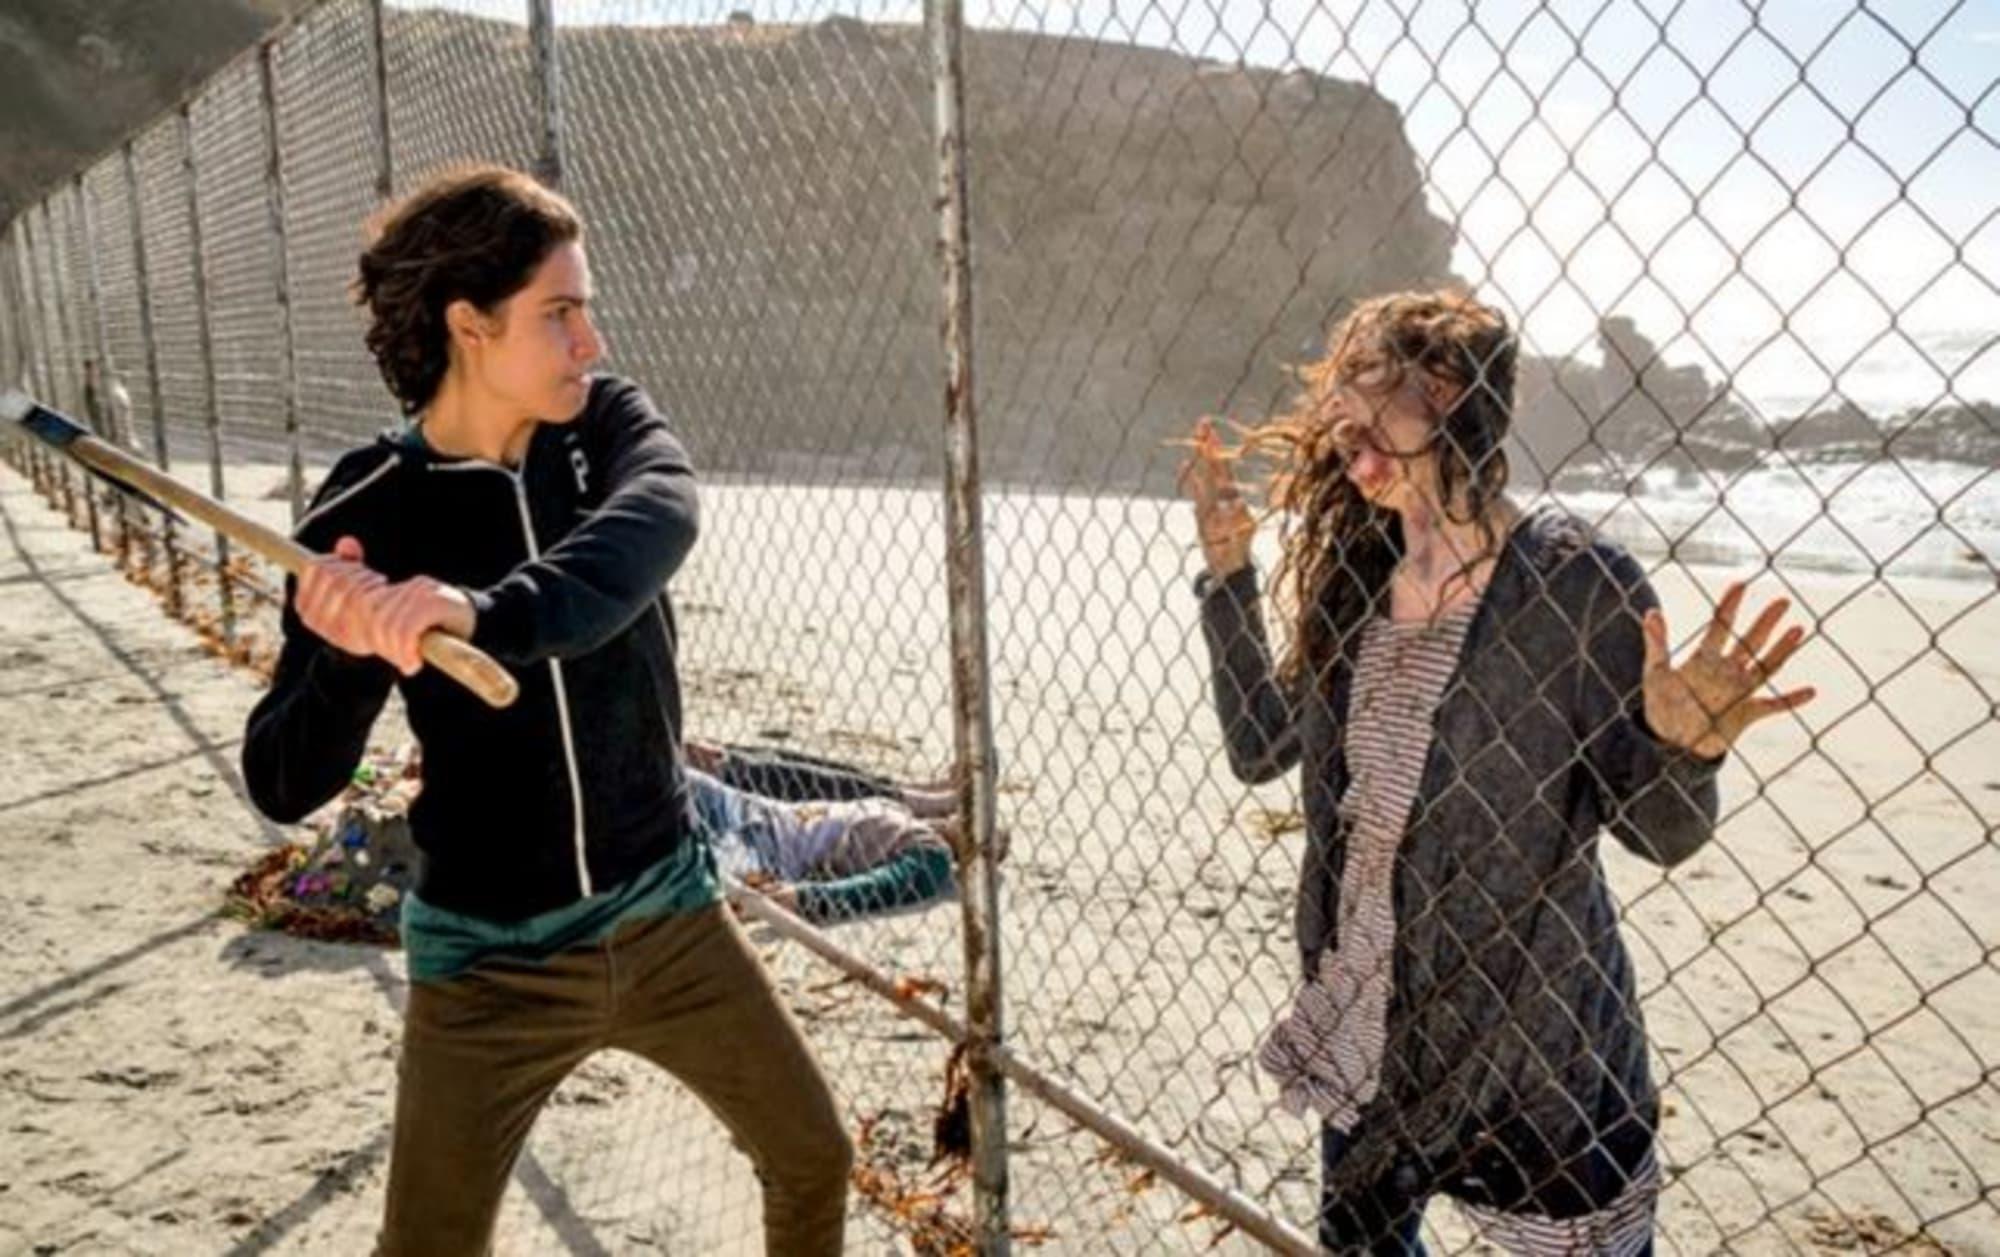 Walking Dead Pickaxe Fortnite Fear The Walking Dead Season 2 A Look Into The Anger Of Chris